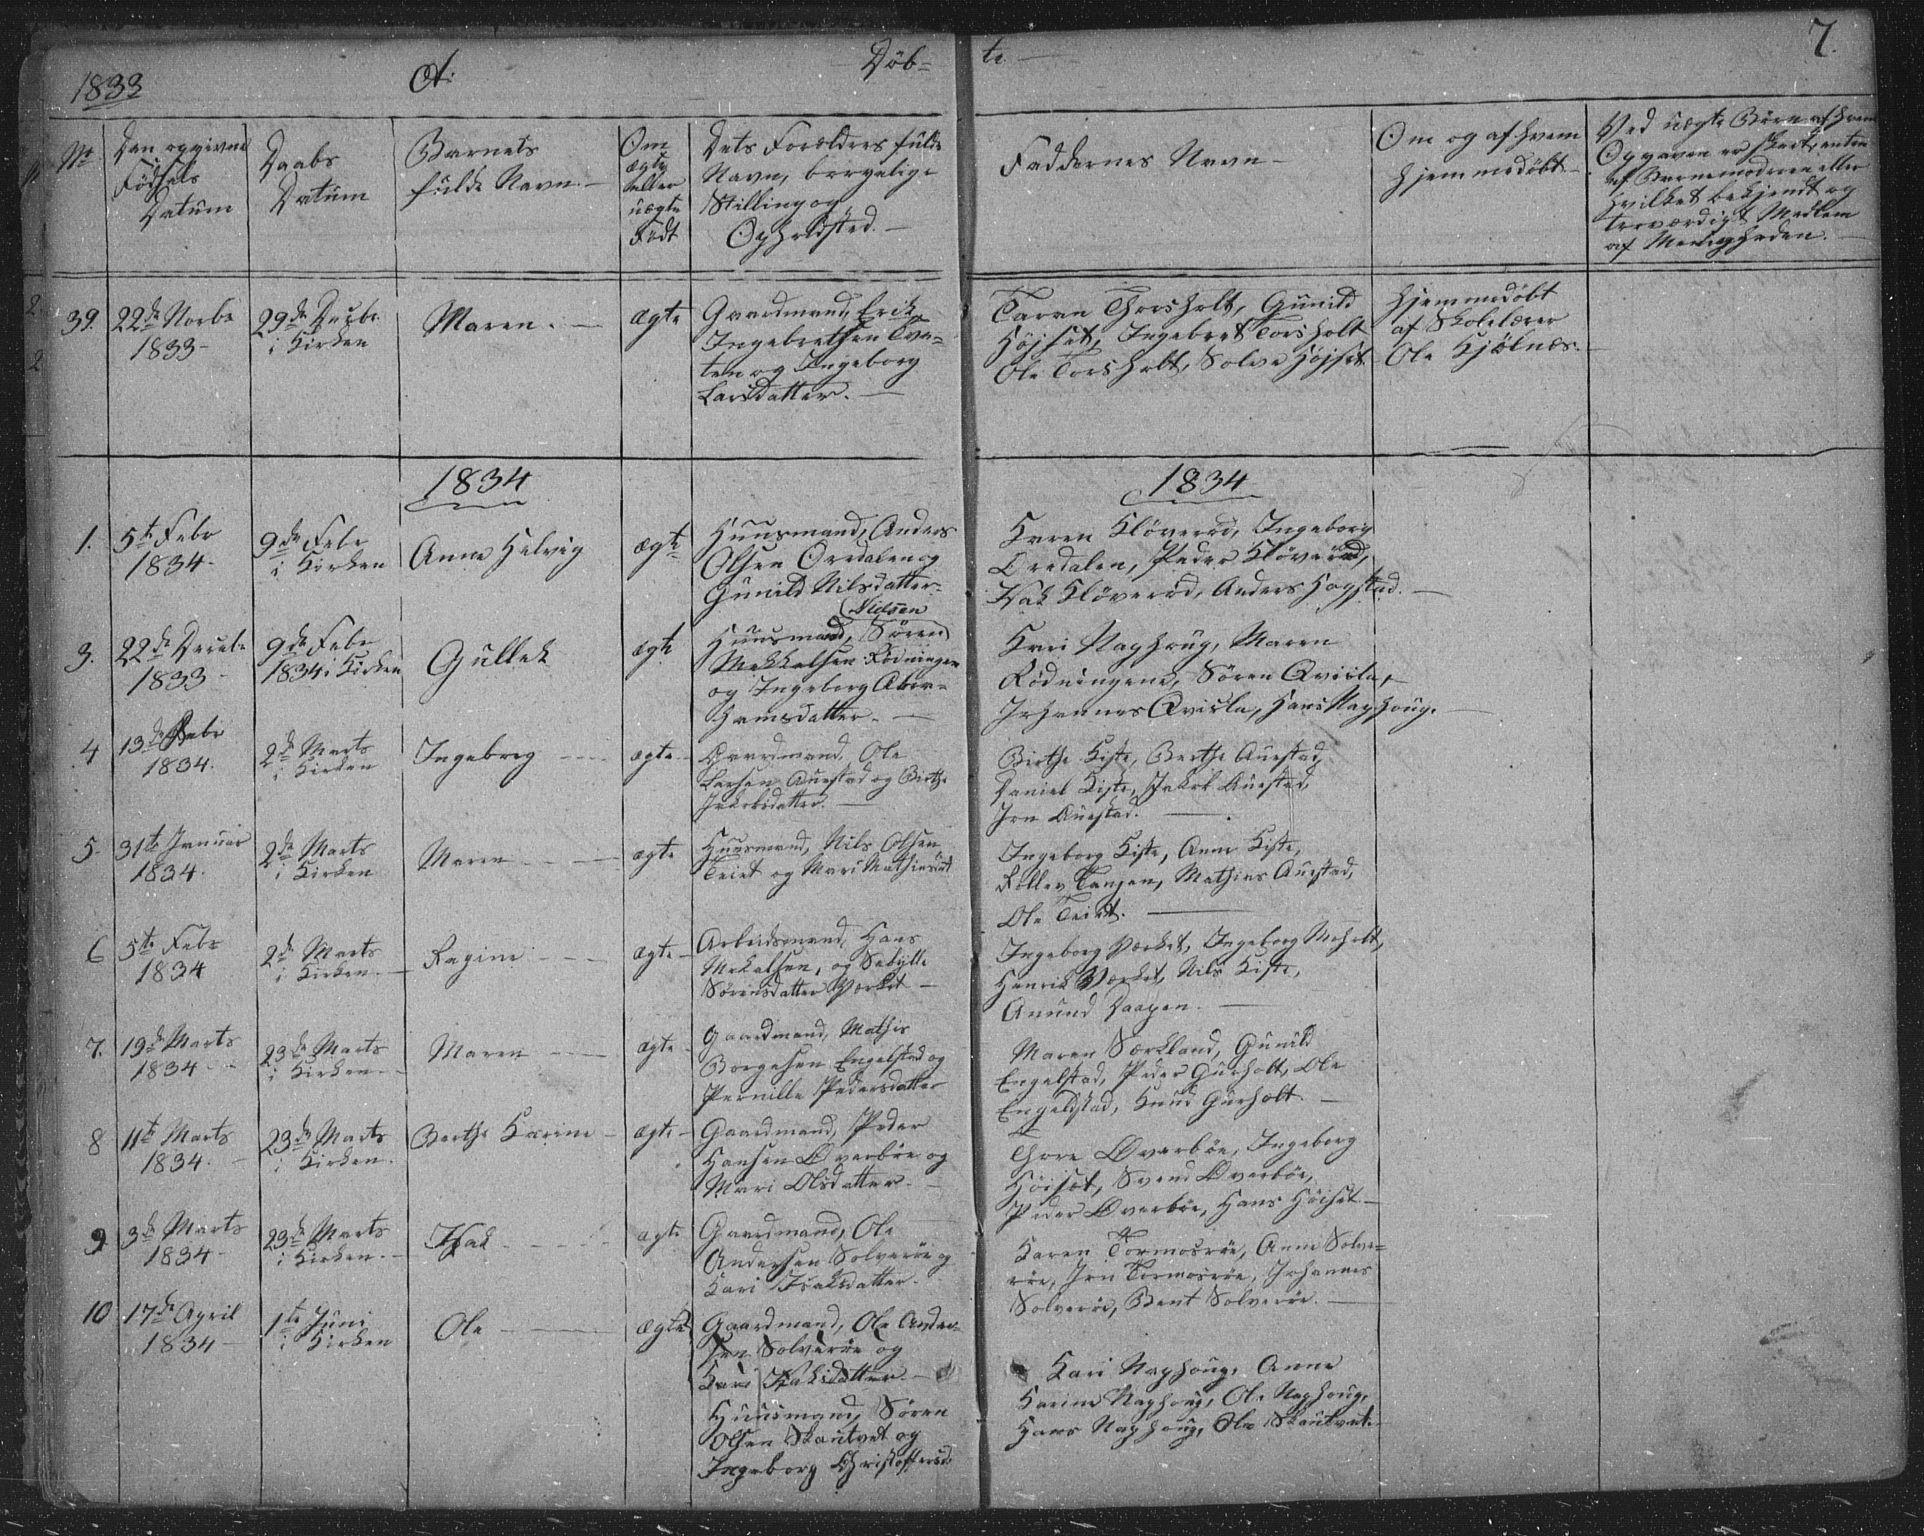 SAKO, Siljan kirkebøker, F/Fa/L0001: Parish register (official) no. 1, 1831-1870, p. 7